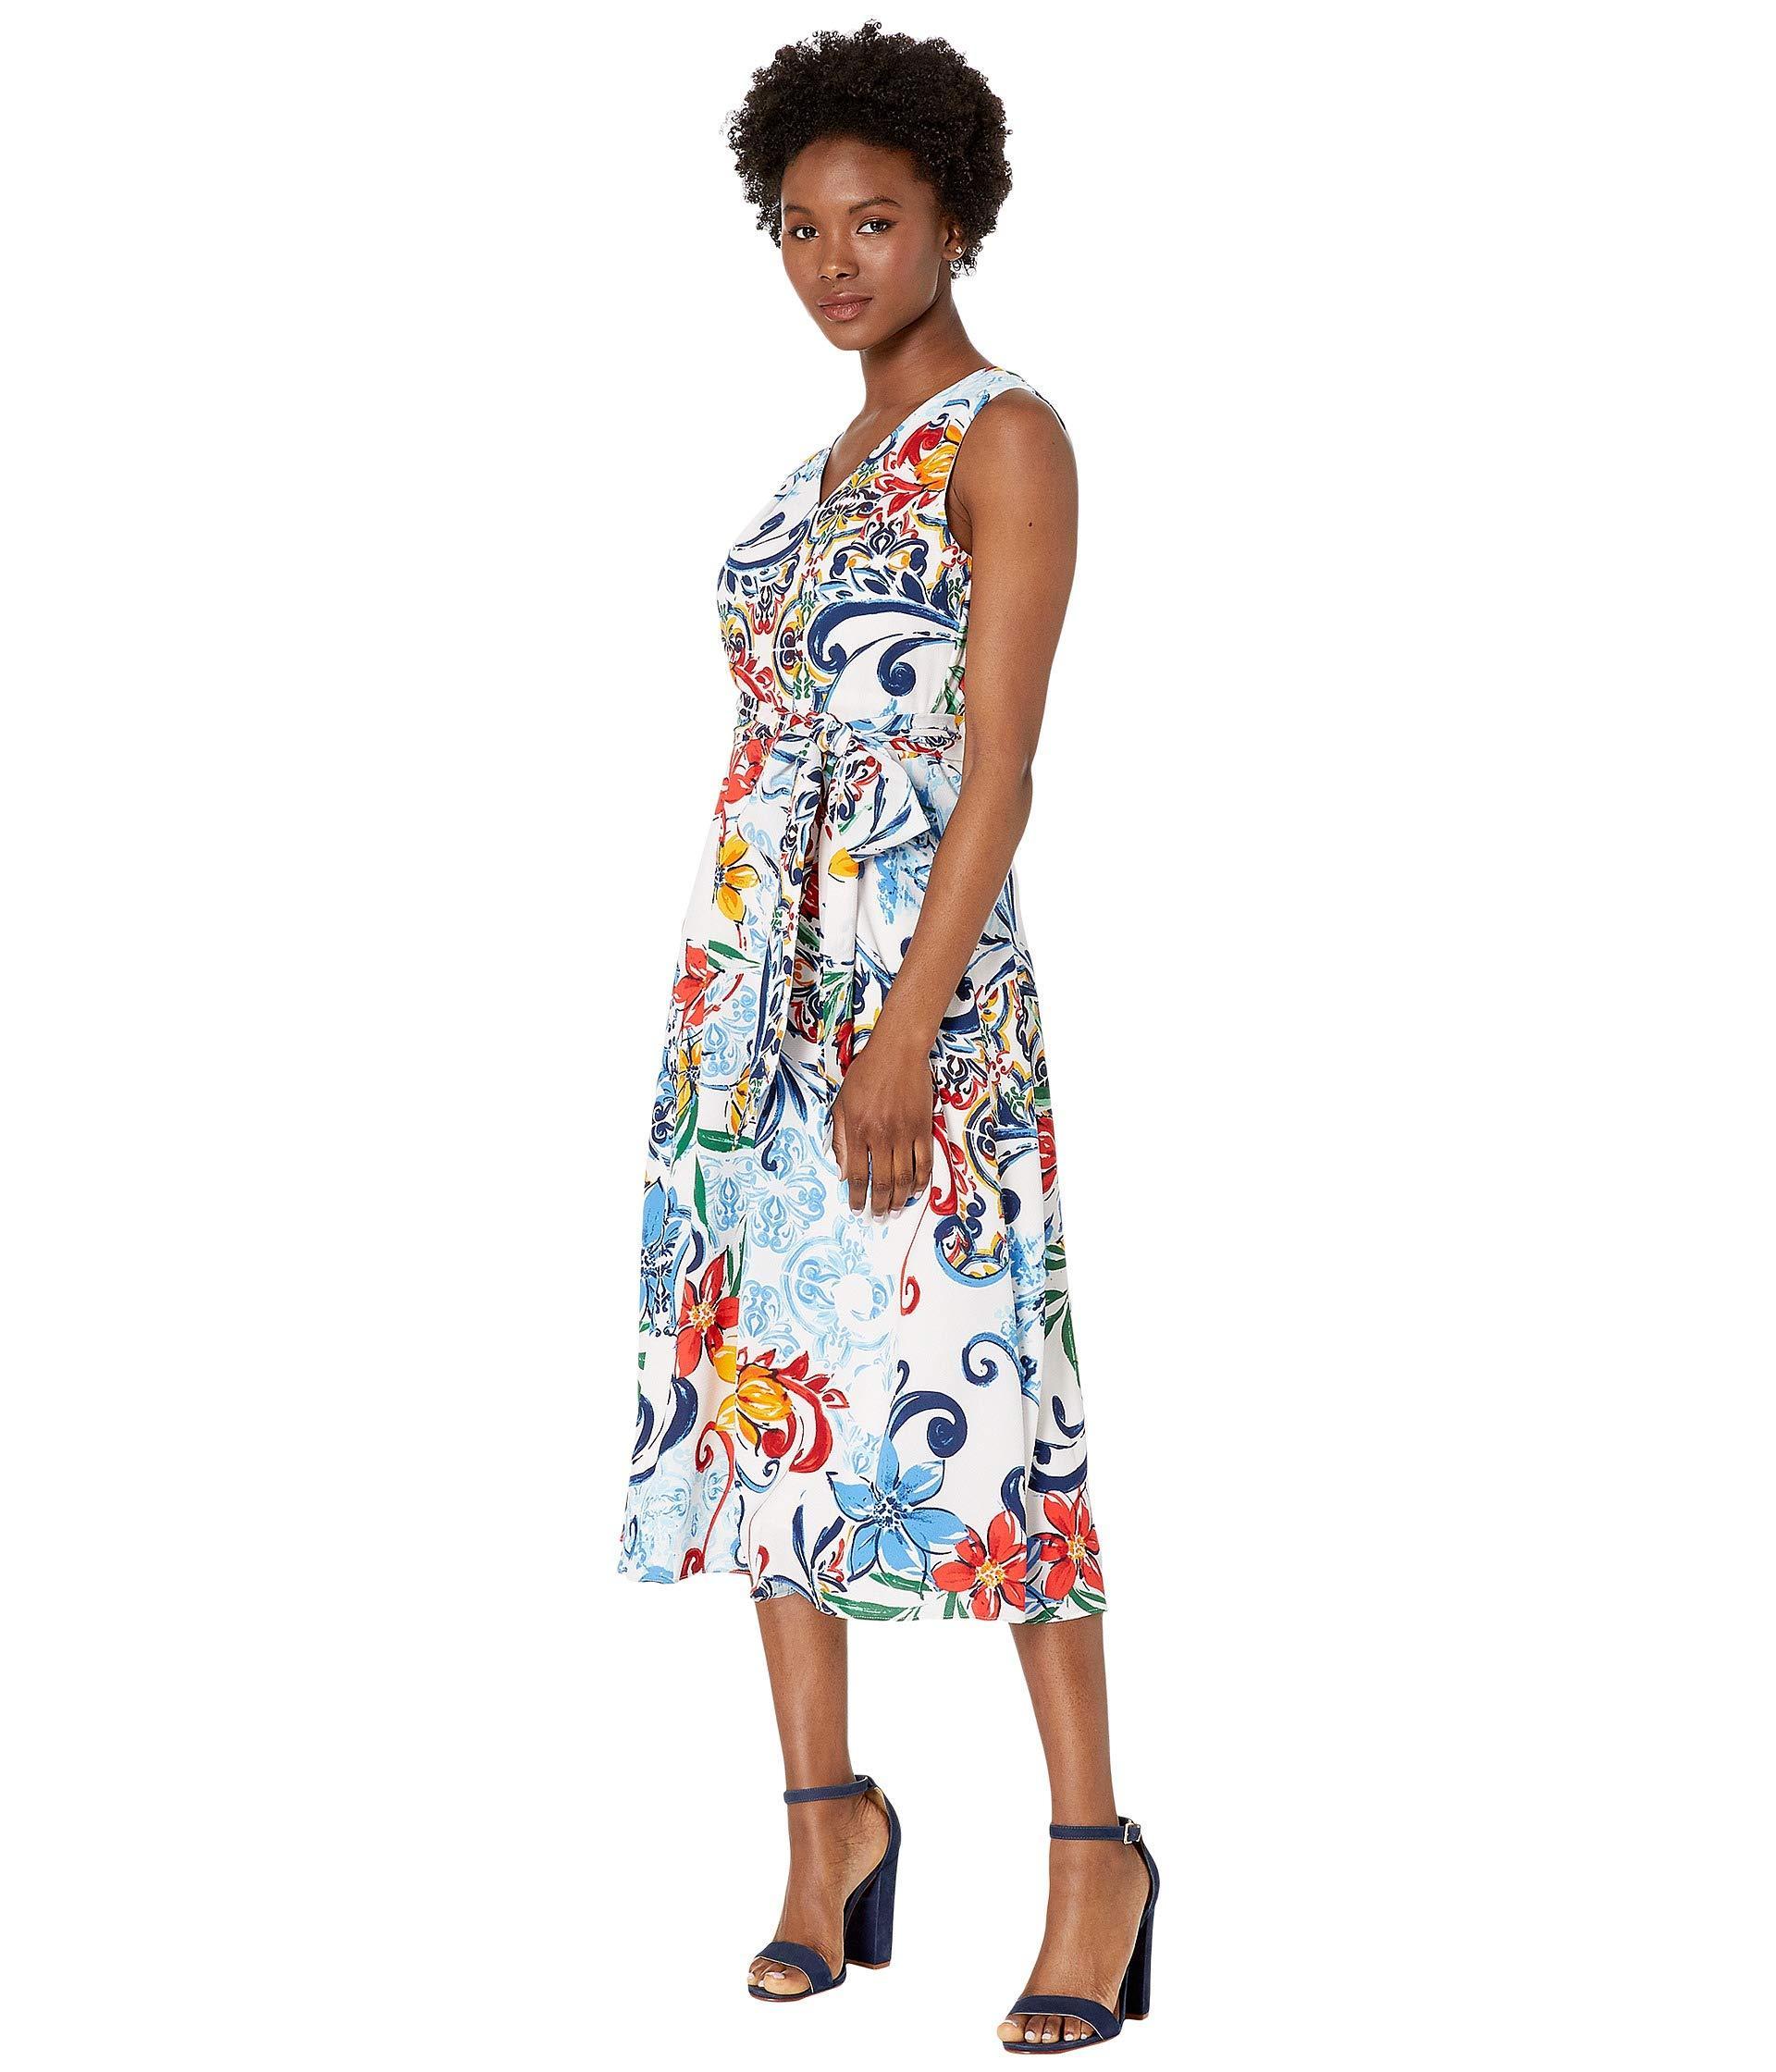 839c1ba294dba Tahari Petite Multicolor Pebble Crepe Side Tie Dress (amalfi Tile Print)  Women's Dress